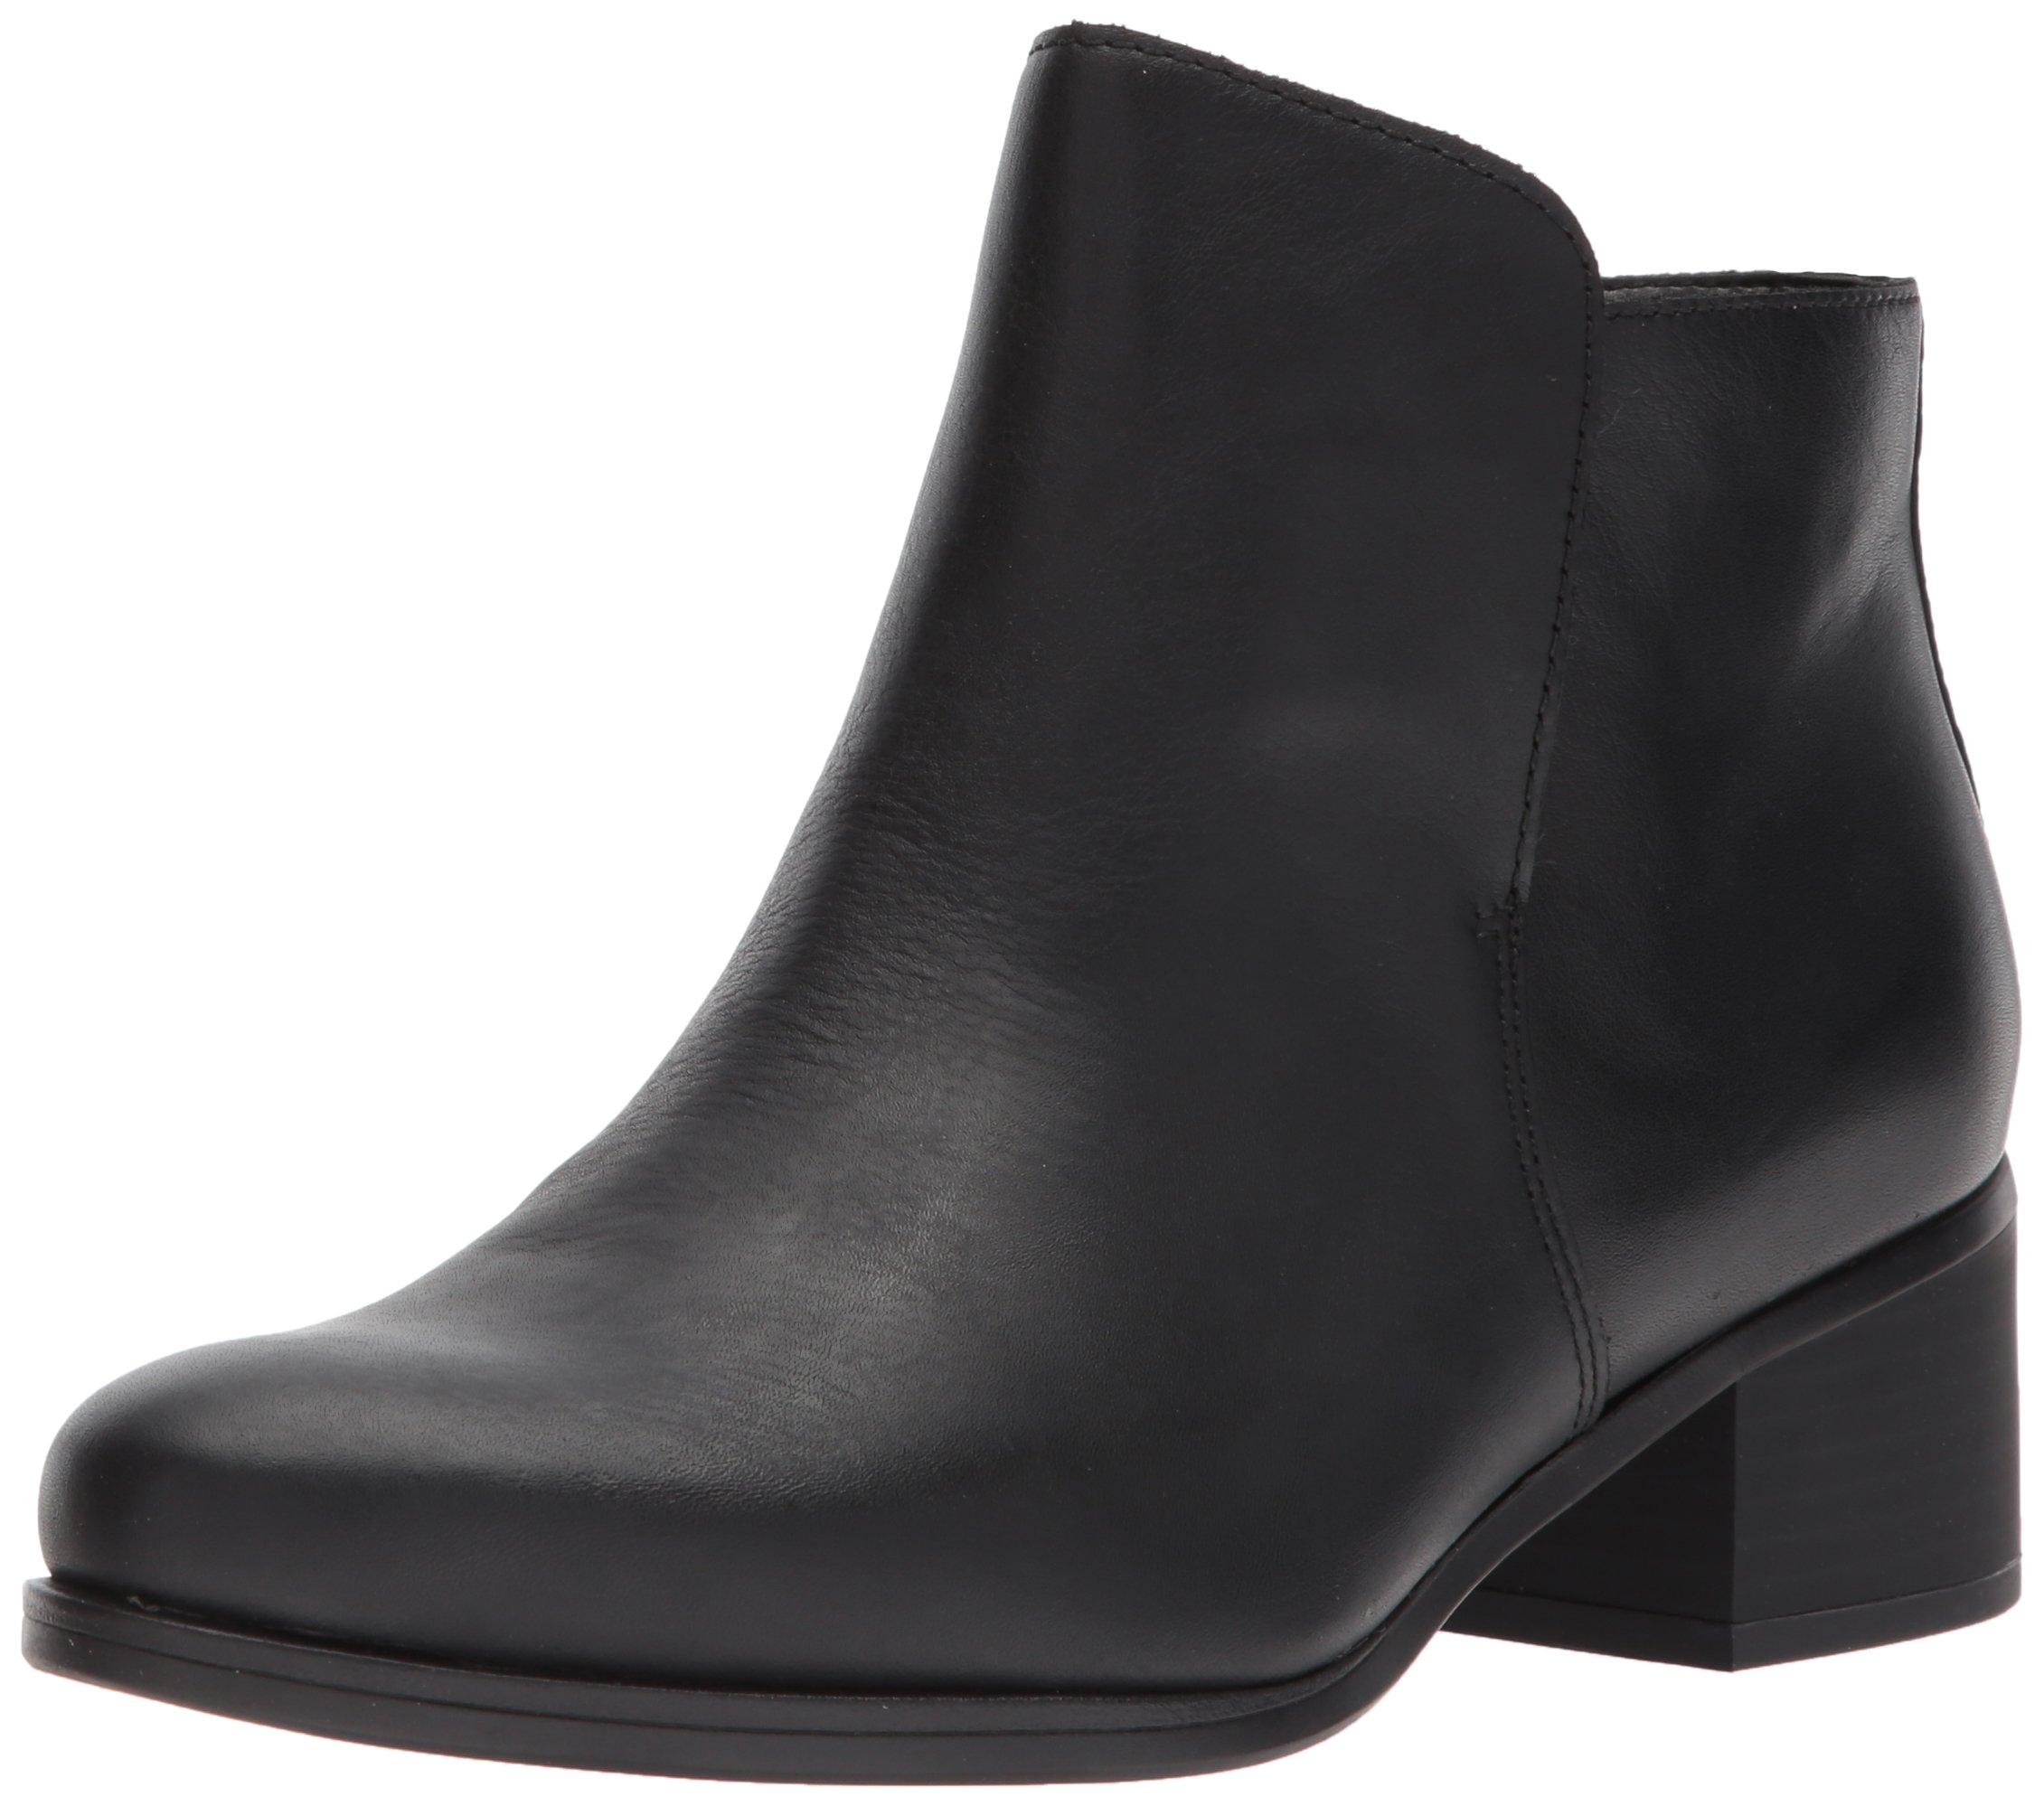 Naturalizer Women's Dawson Chelsea Boot, Black, 7 Medium US